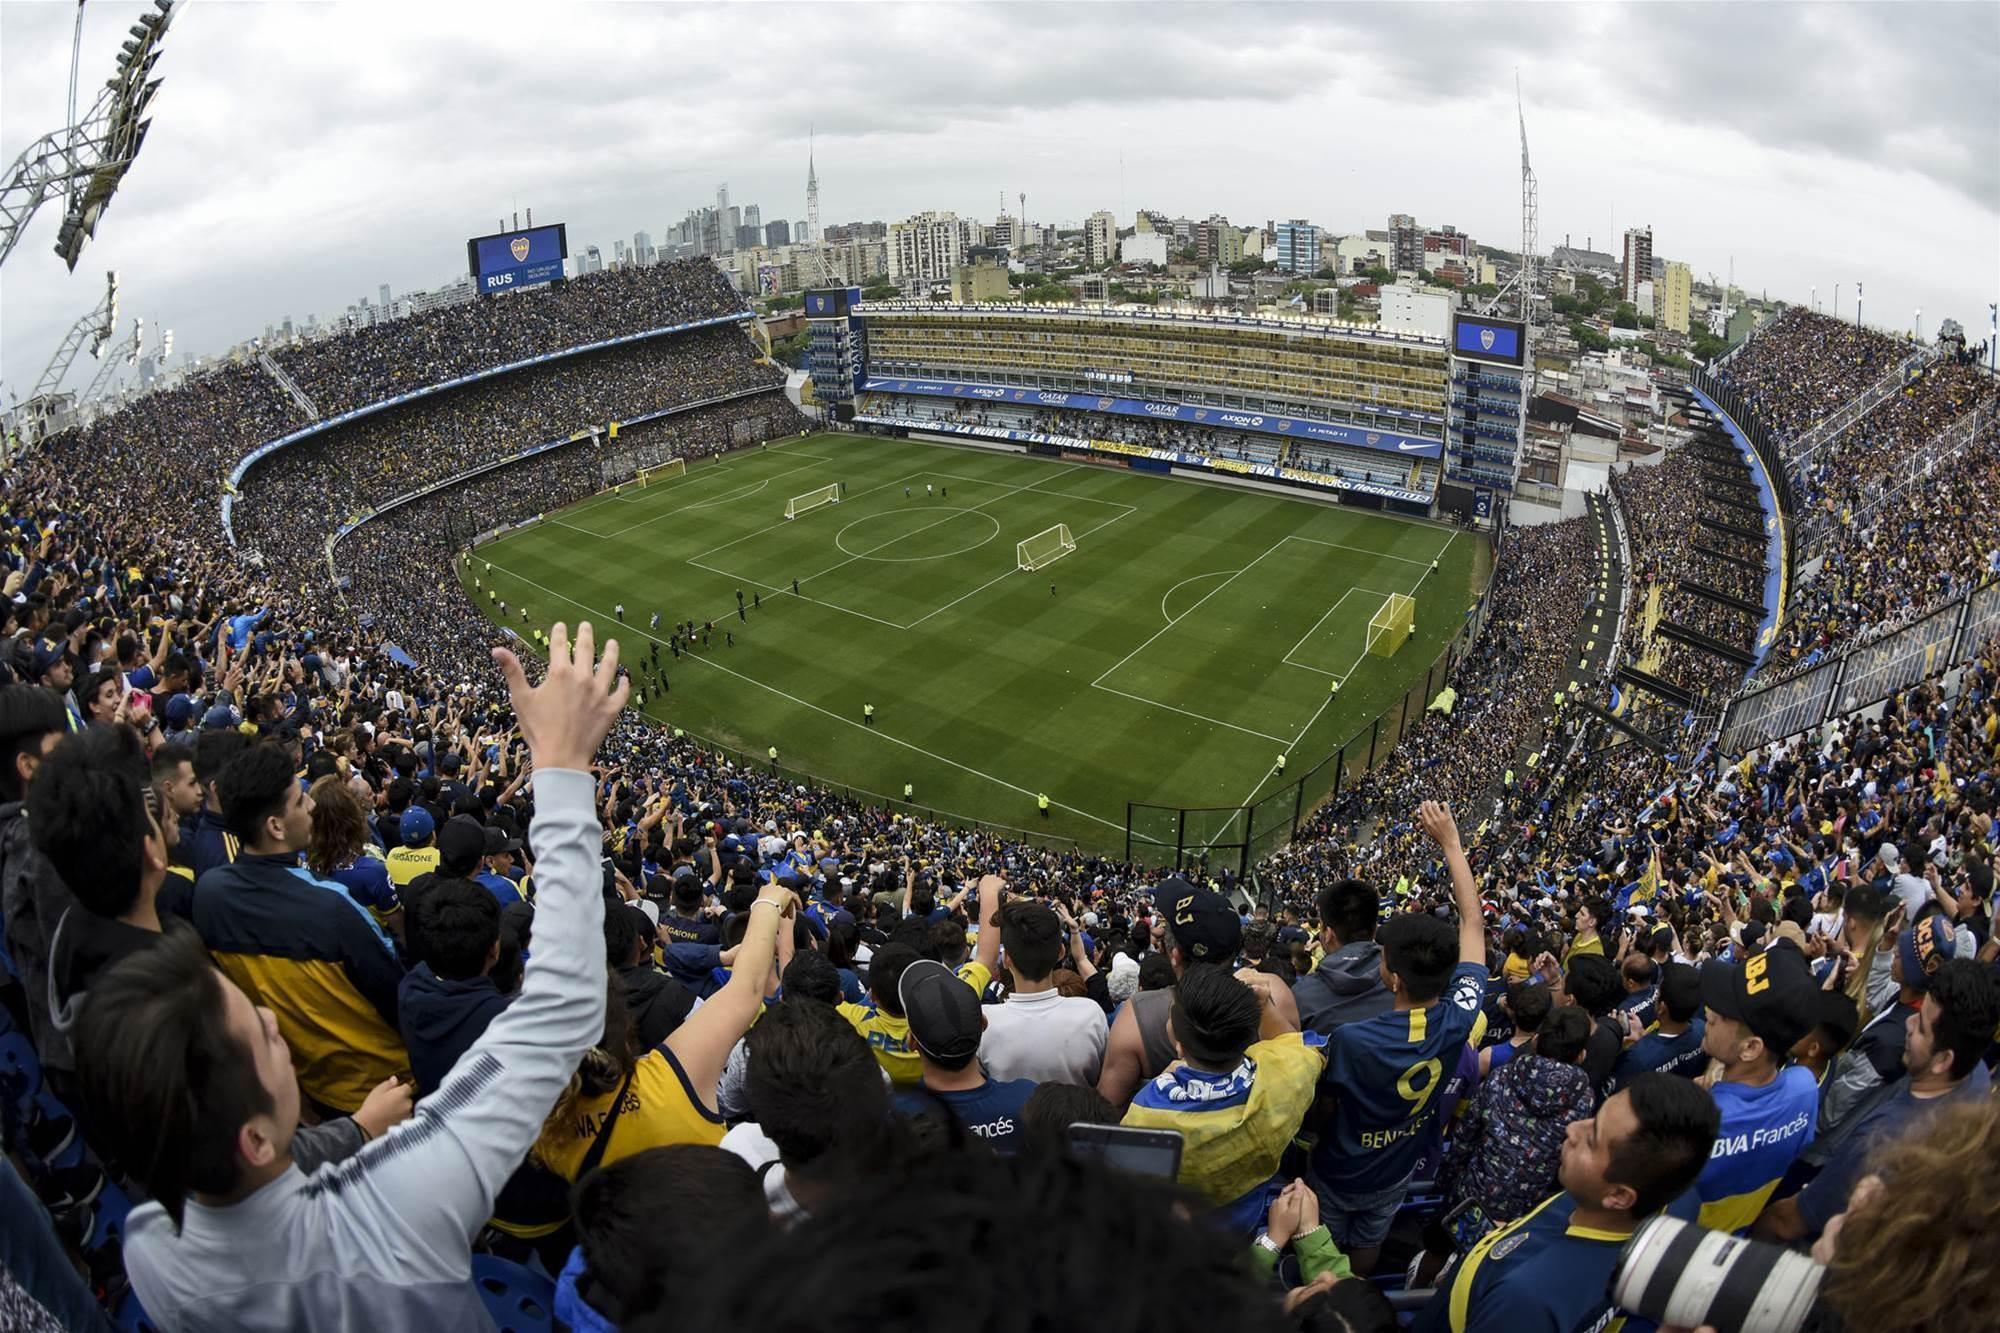 Watch! Boca fans fill stadium for training session